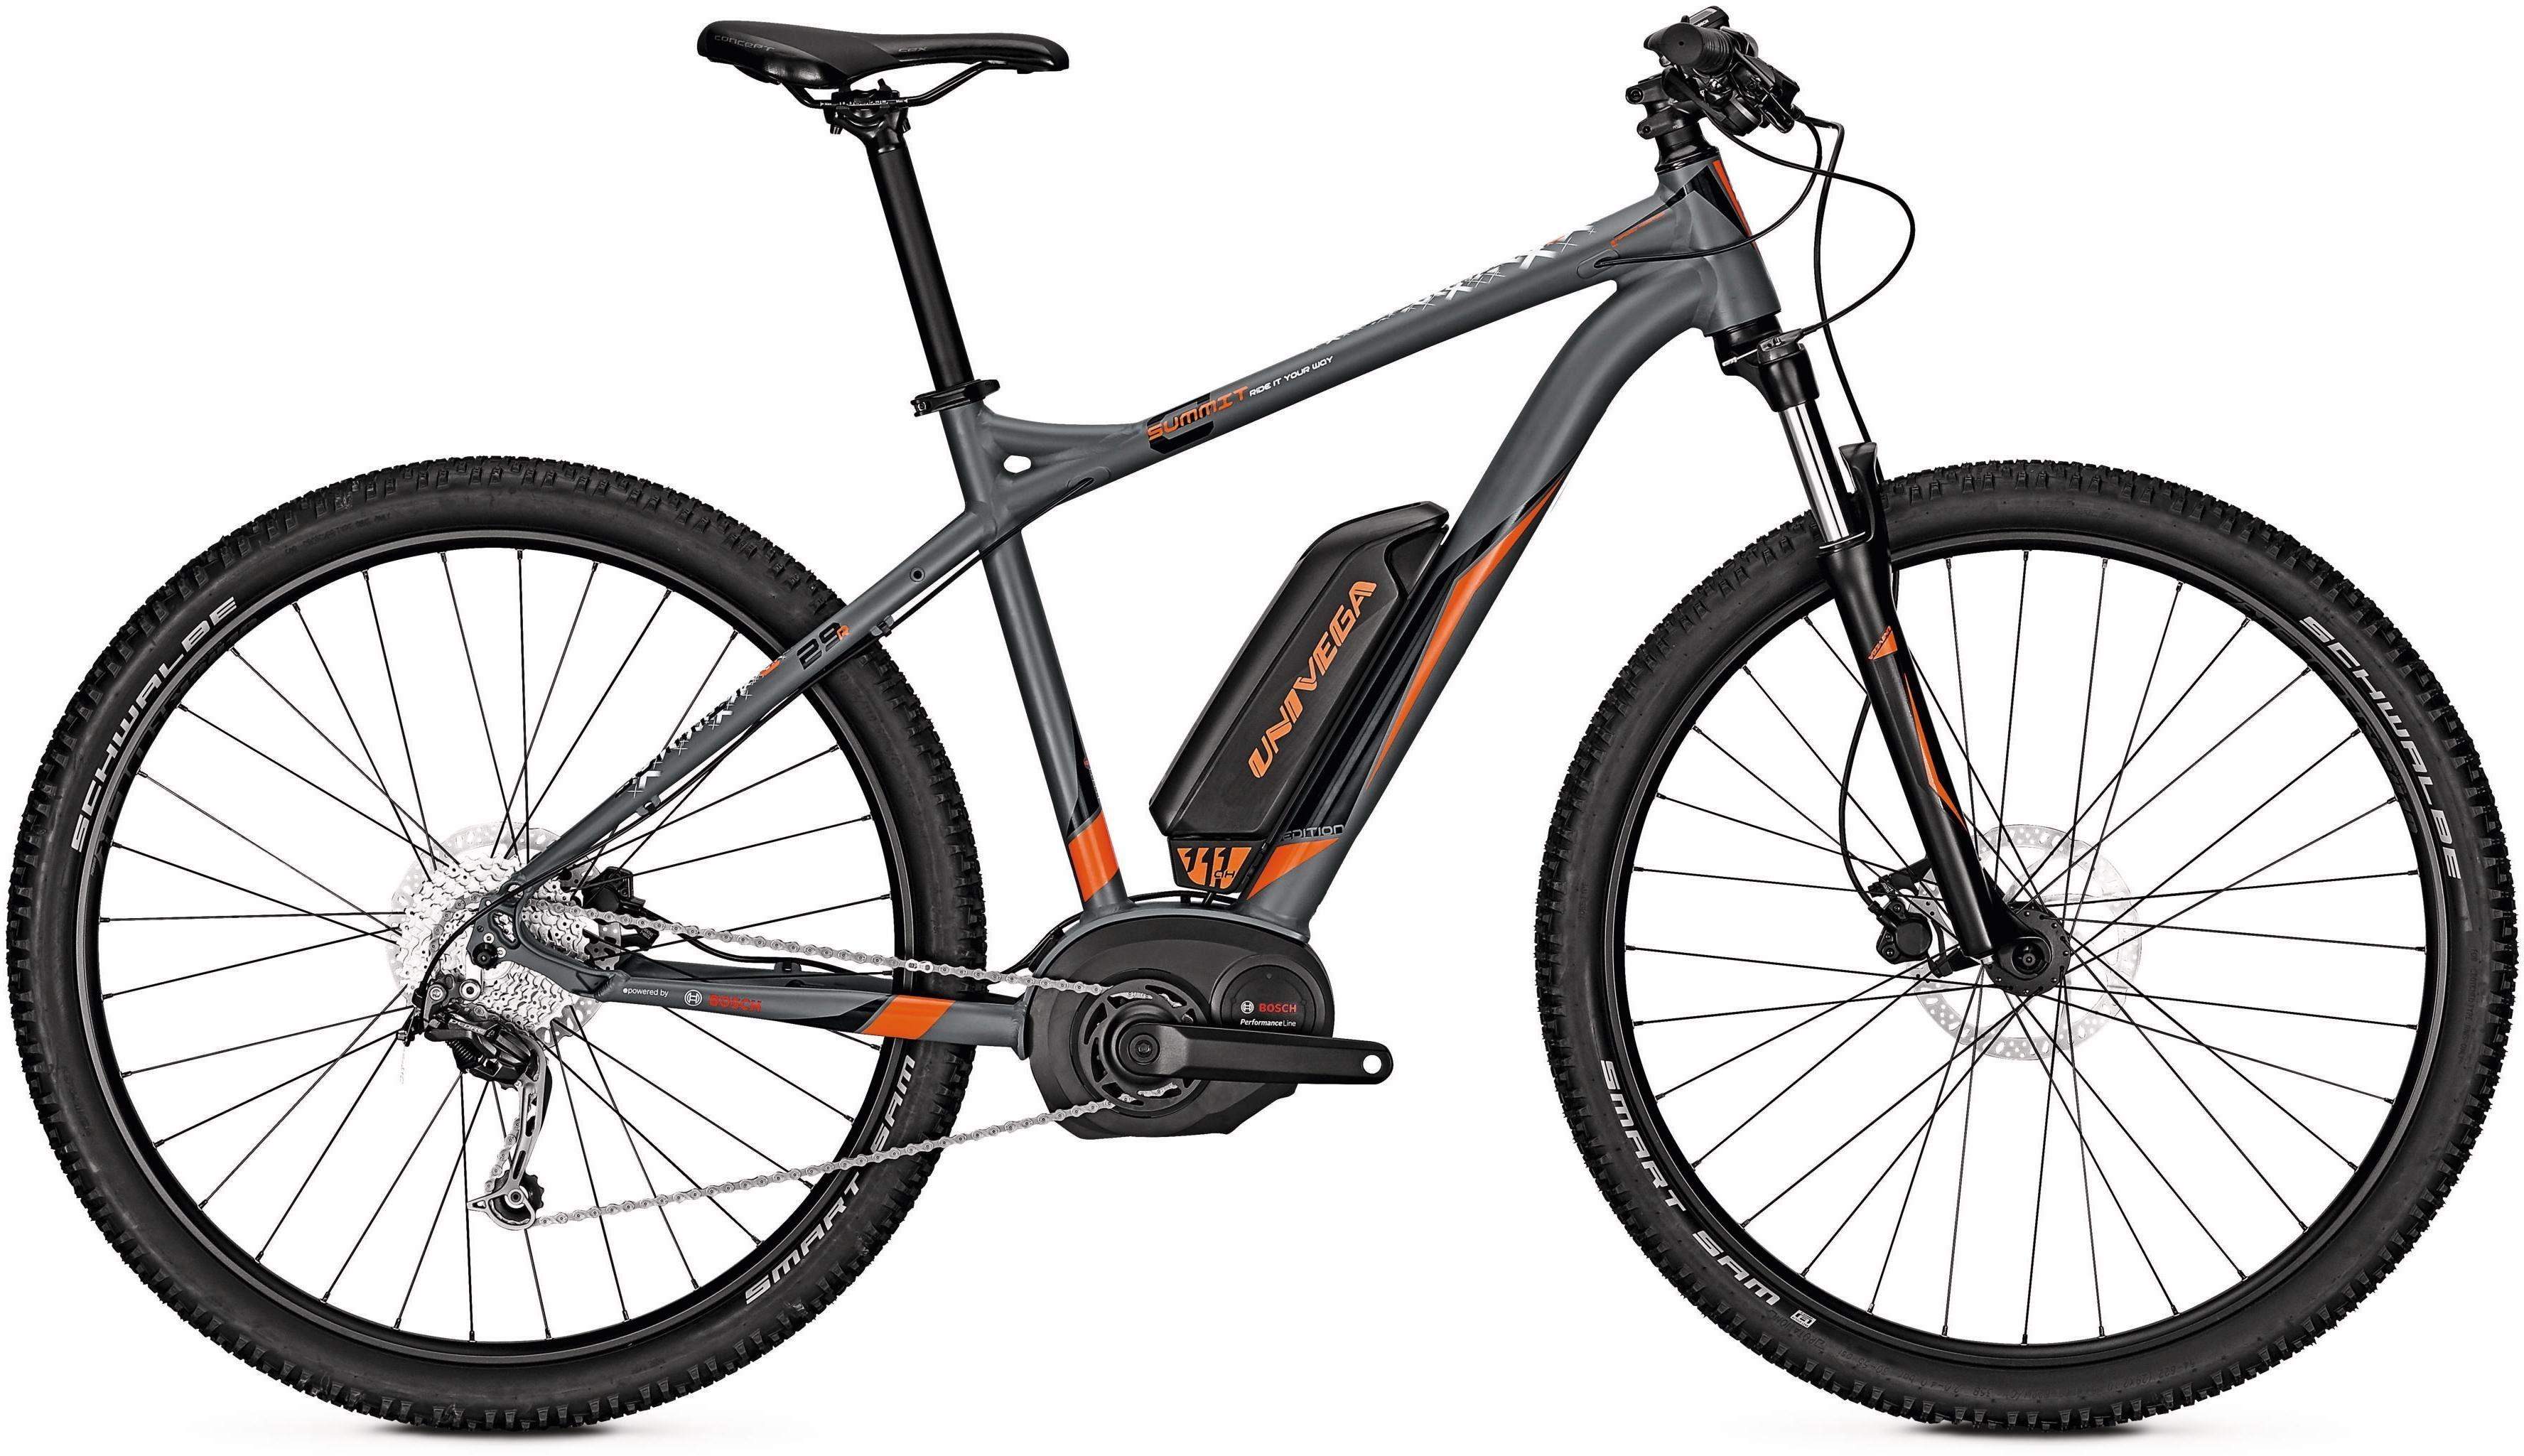 Univega Herren E-Bike ATB, 29 Zoll, 9 Gang Shimano Deore, »Summit E Edition«